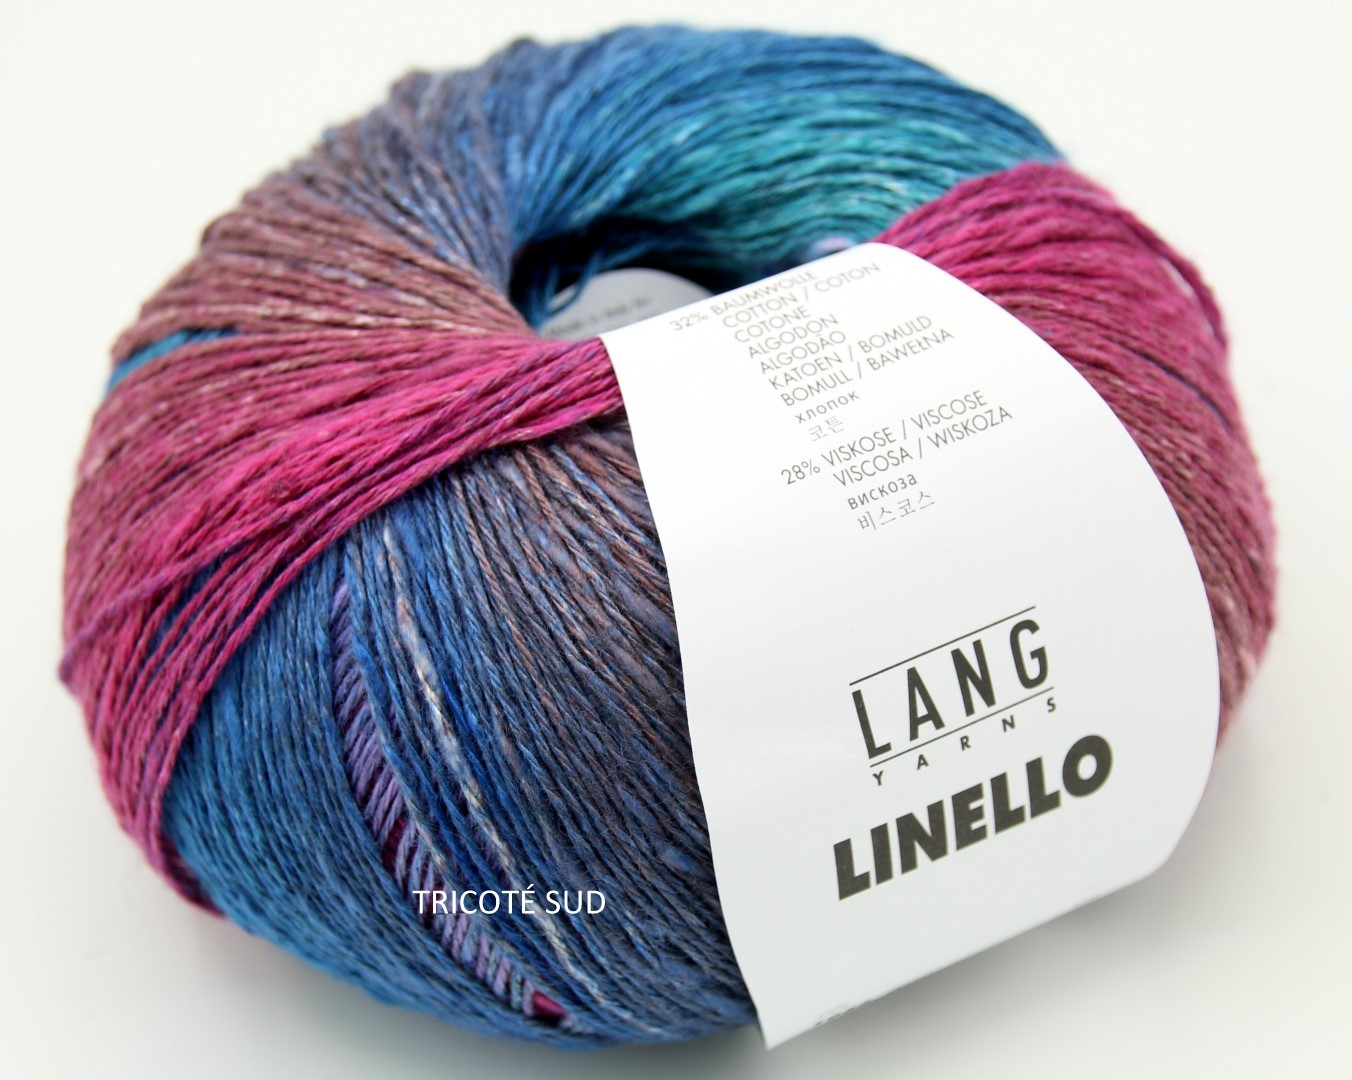 LINELLO LANG YARNS COLORIS 10 (2) (Large)